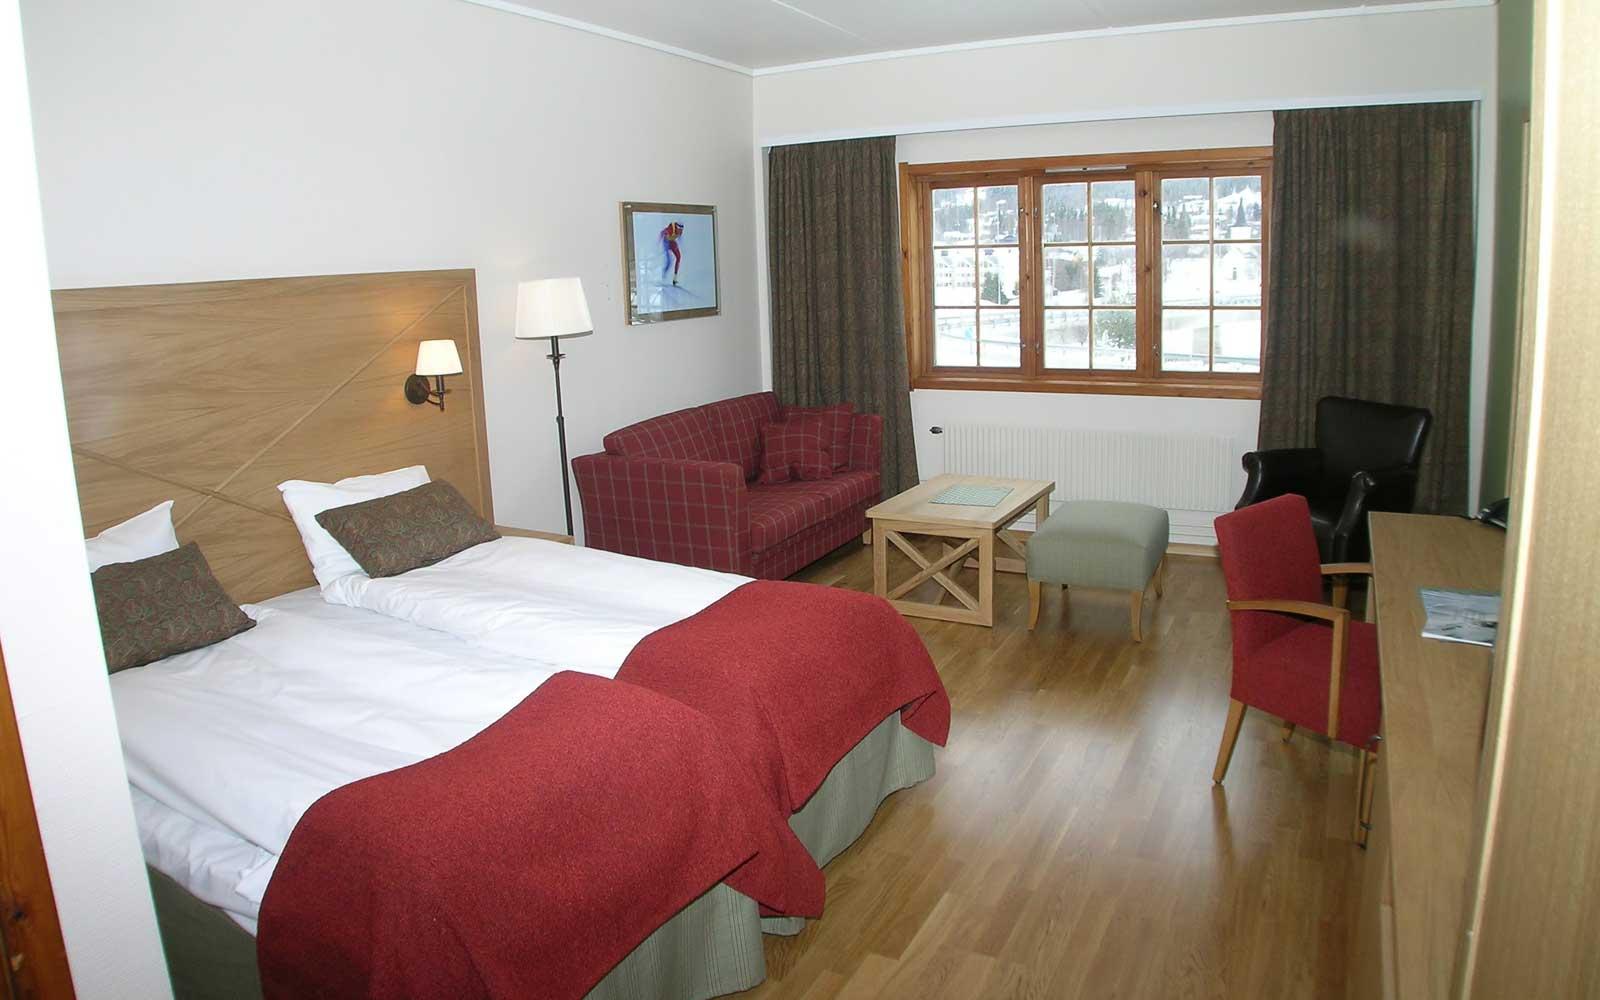 Trysil-Knut Hotell rom 222 Sjumilskogen booking Trysil